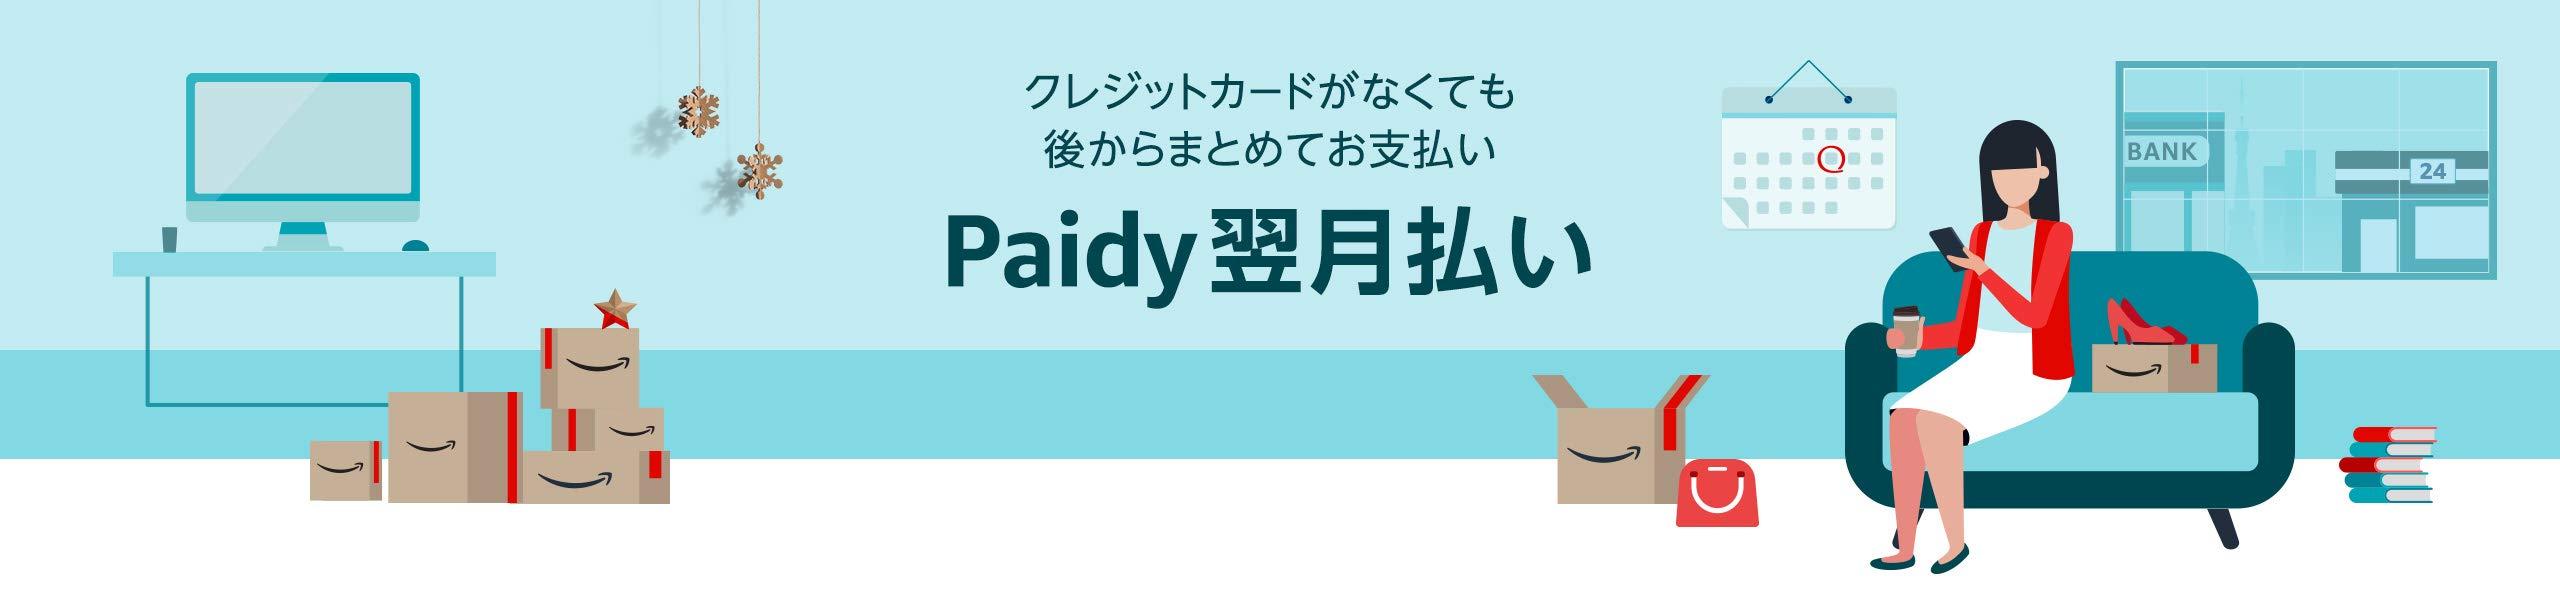 Paidy翌月払い